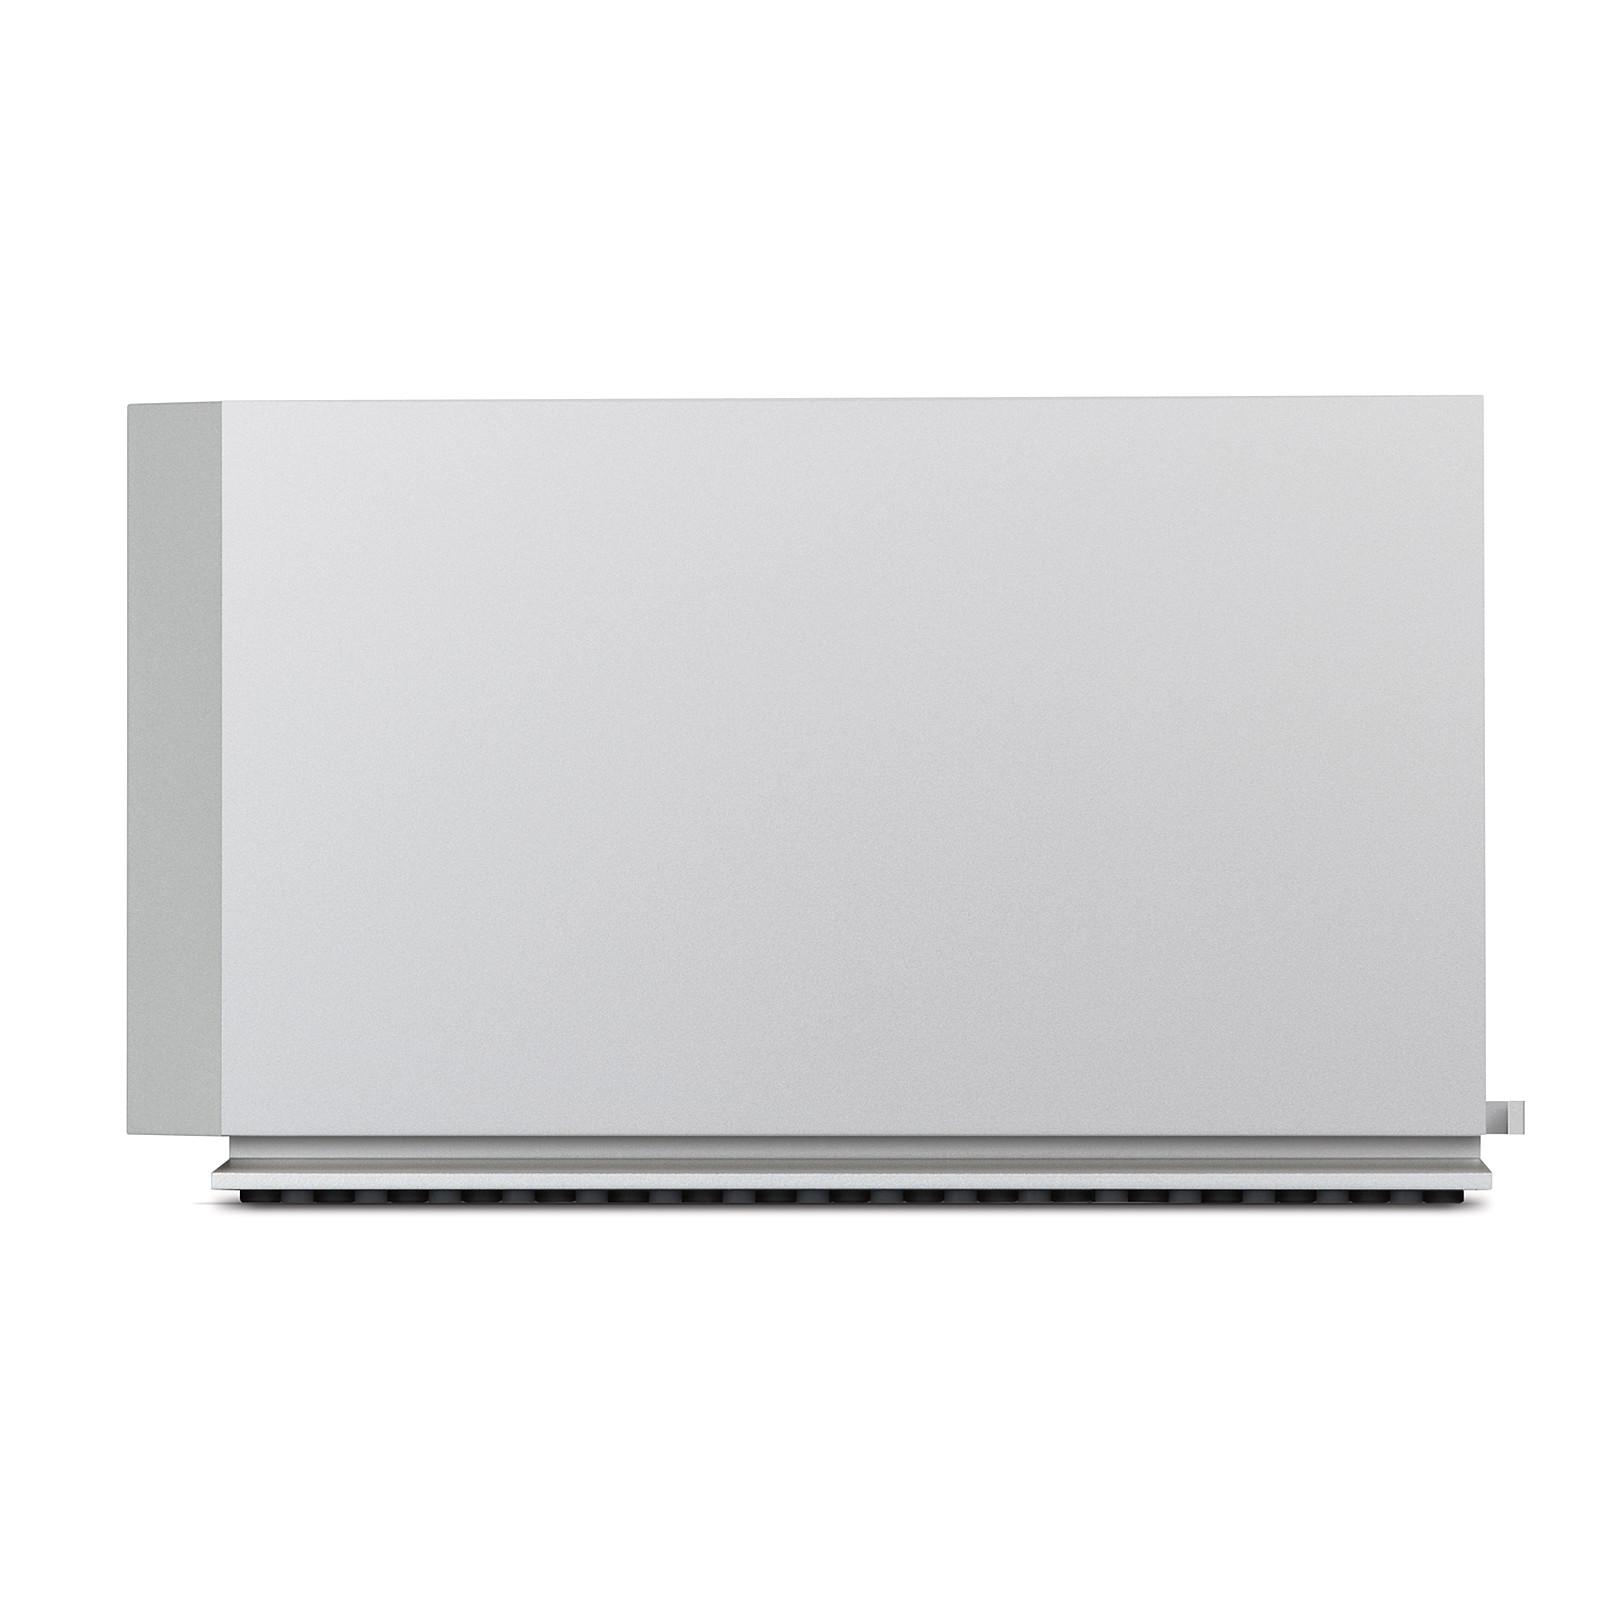 STEX4000200 LaCie D2 Thunderbolt 2 USB 3.0 Disque dur externe 4 TB